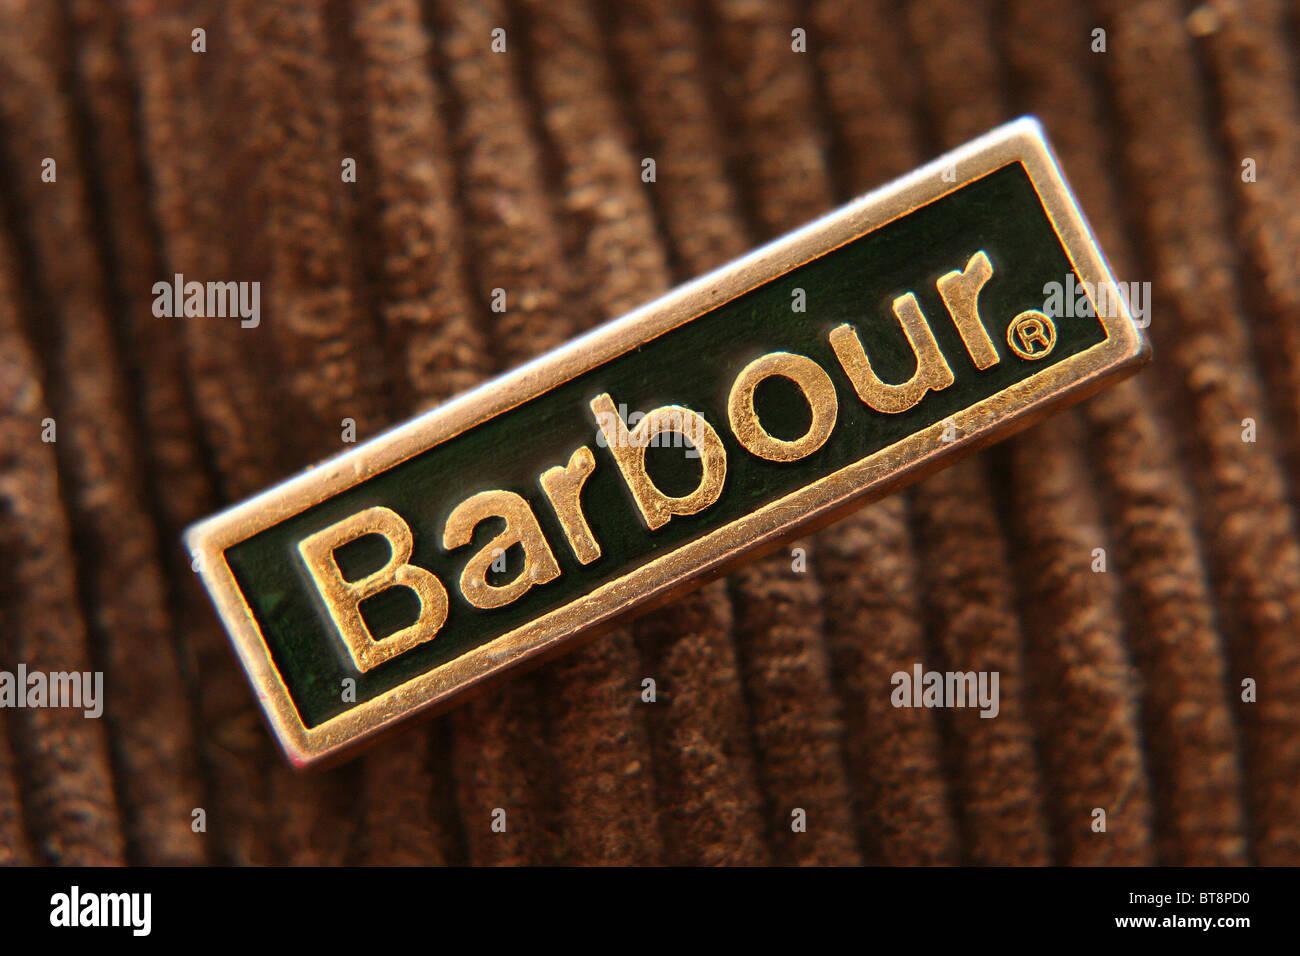 Un badge barbour pined per un tradizionale cera barbour giacca Foto ... a6bfa8cc6ab8